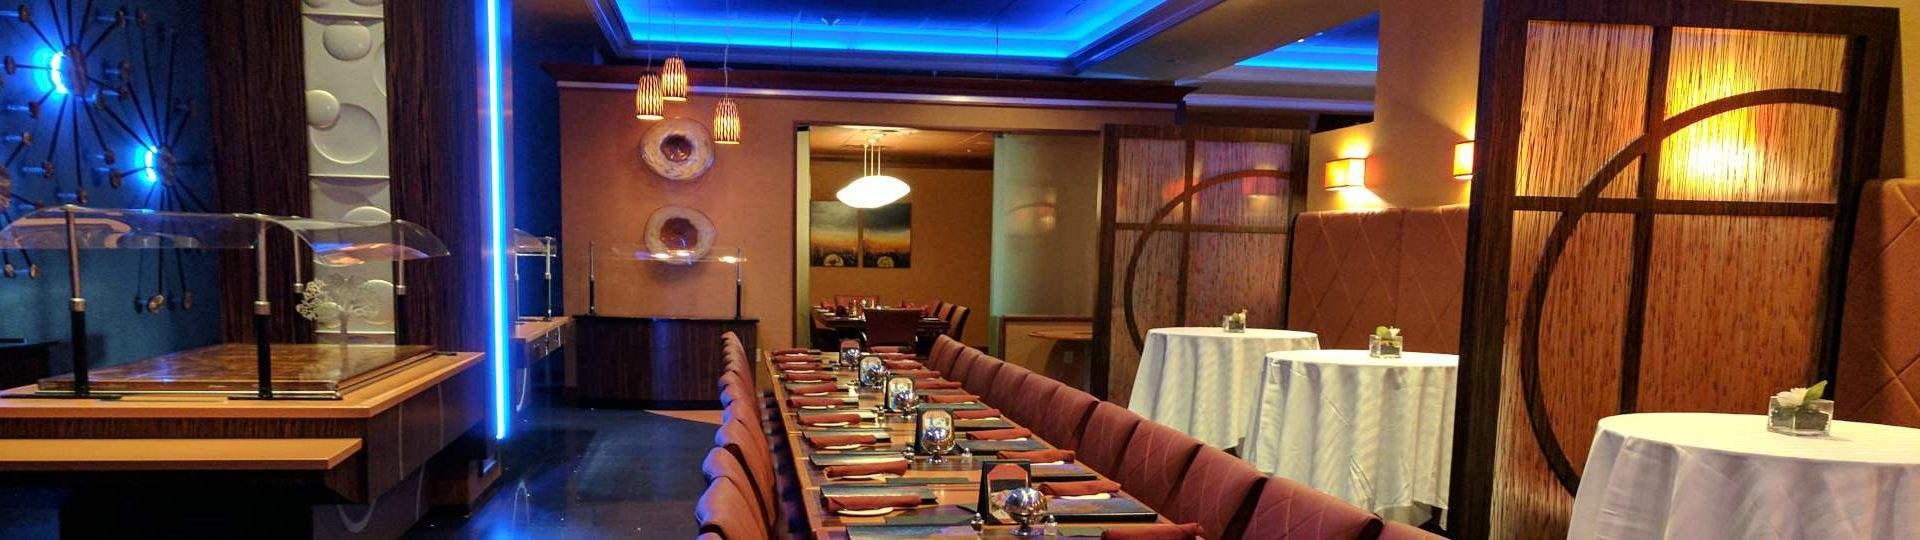 Luna Restaurant & Lounge, Florida - Events